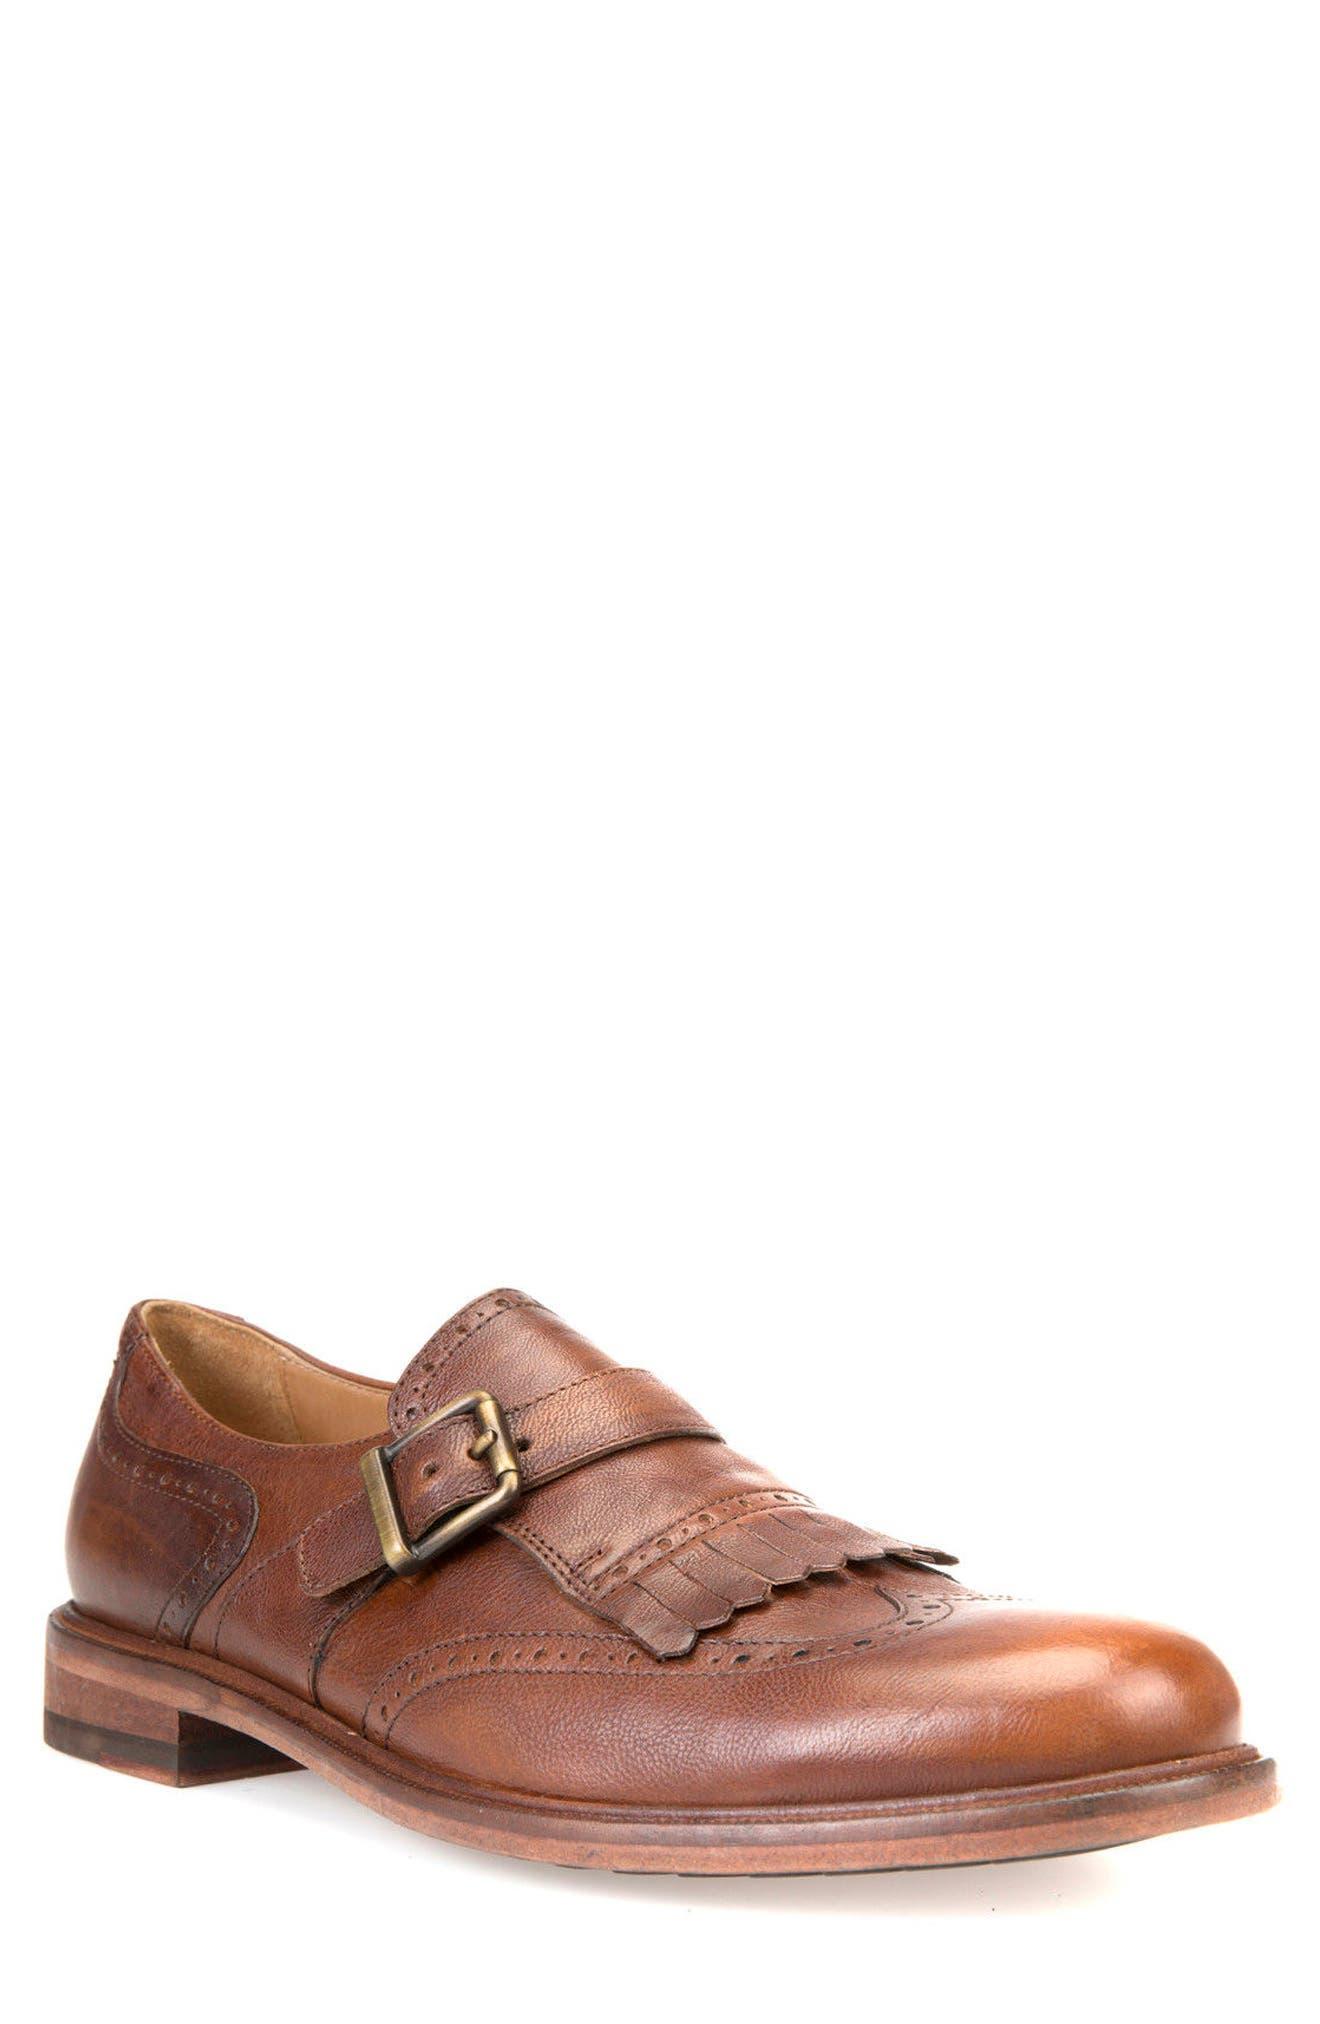 Geox Guildford 8 Monk Strap Shoe (Men)